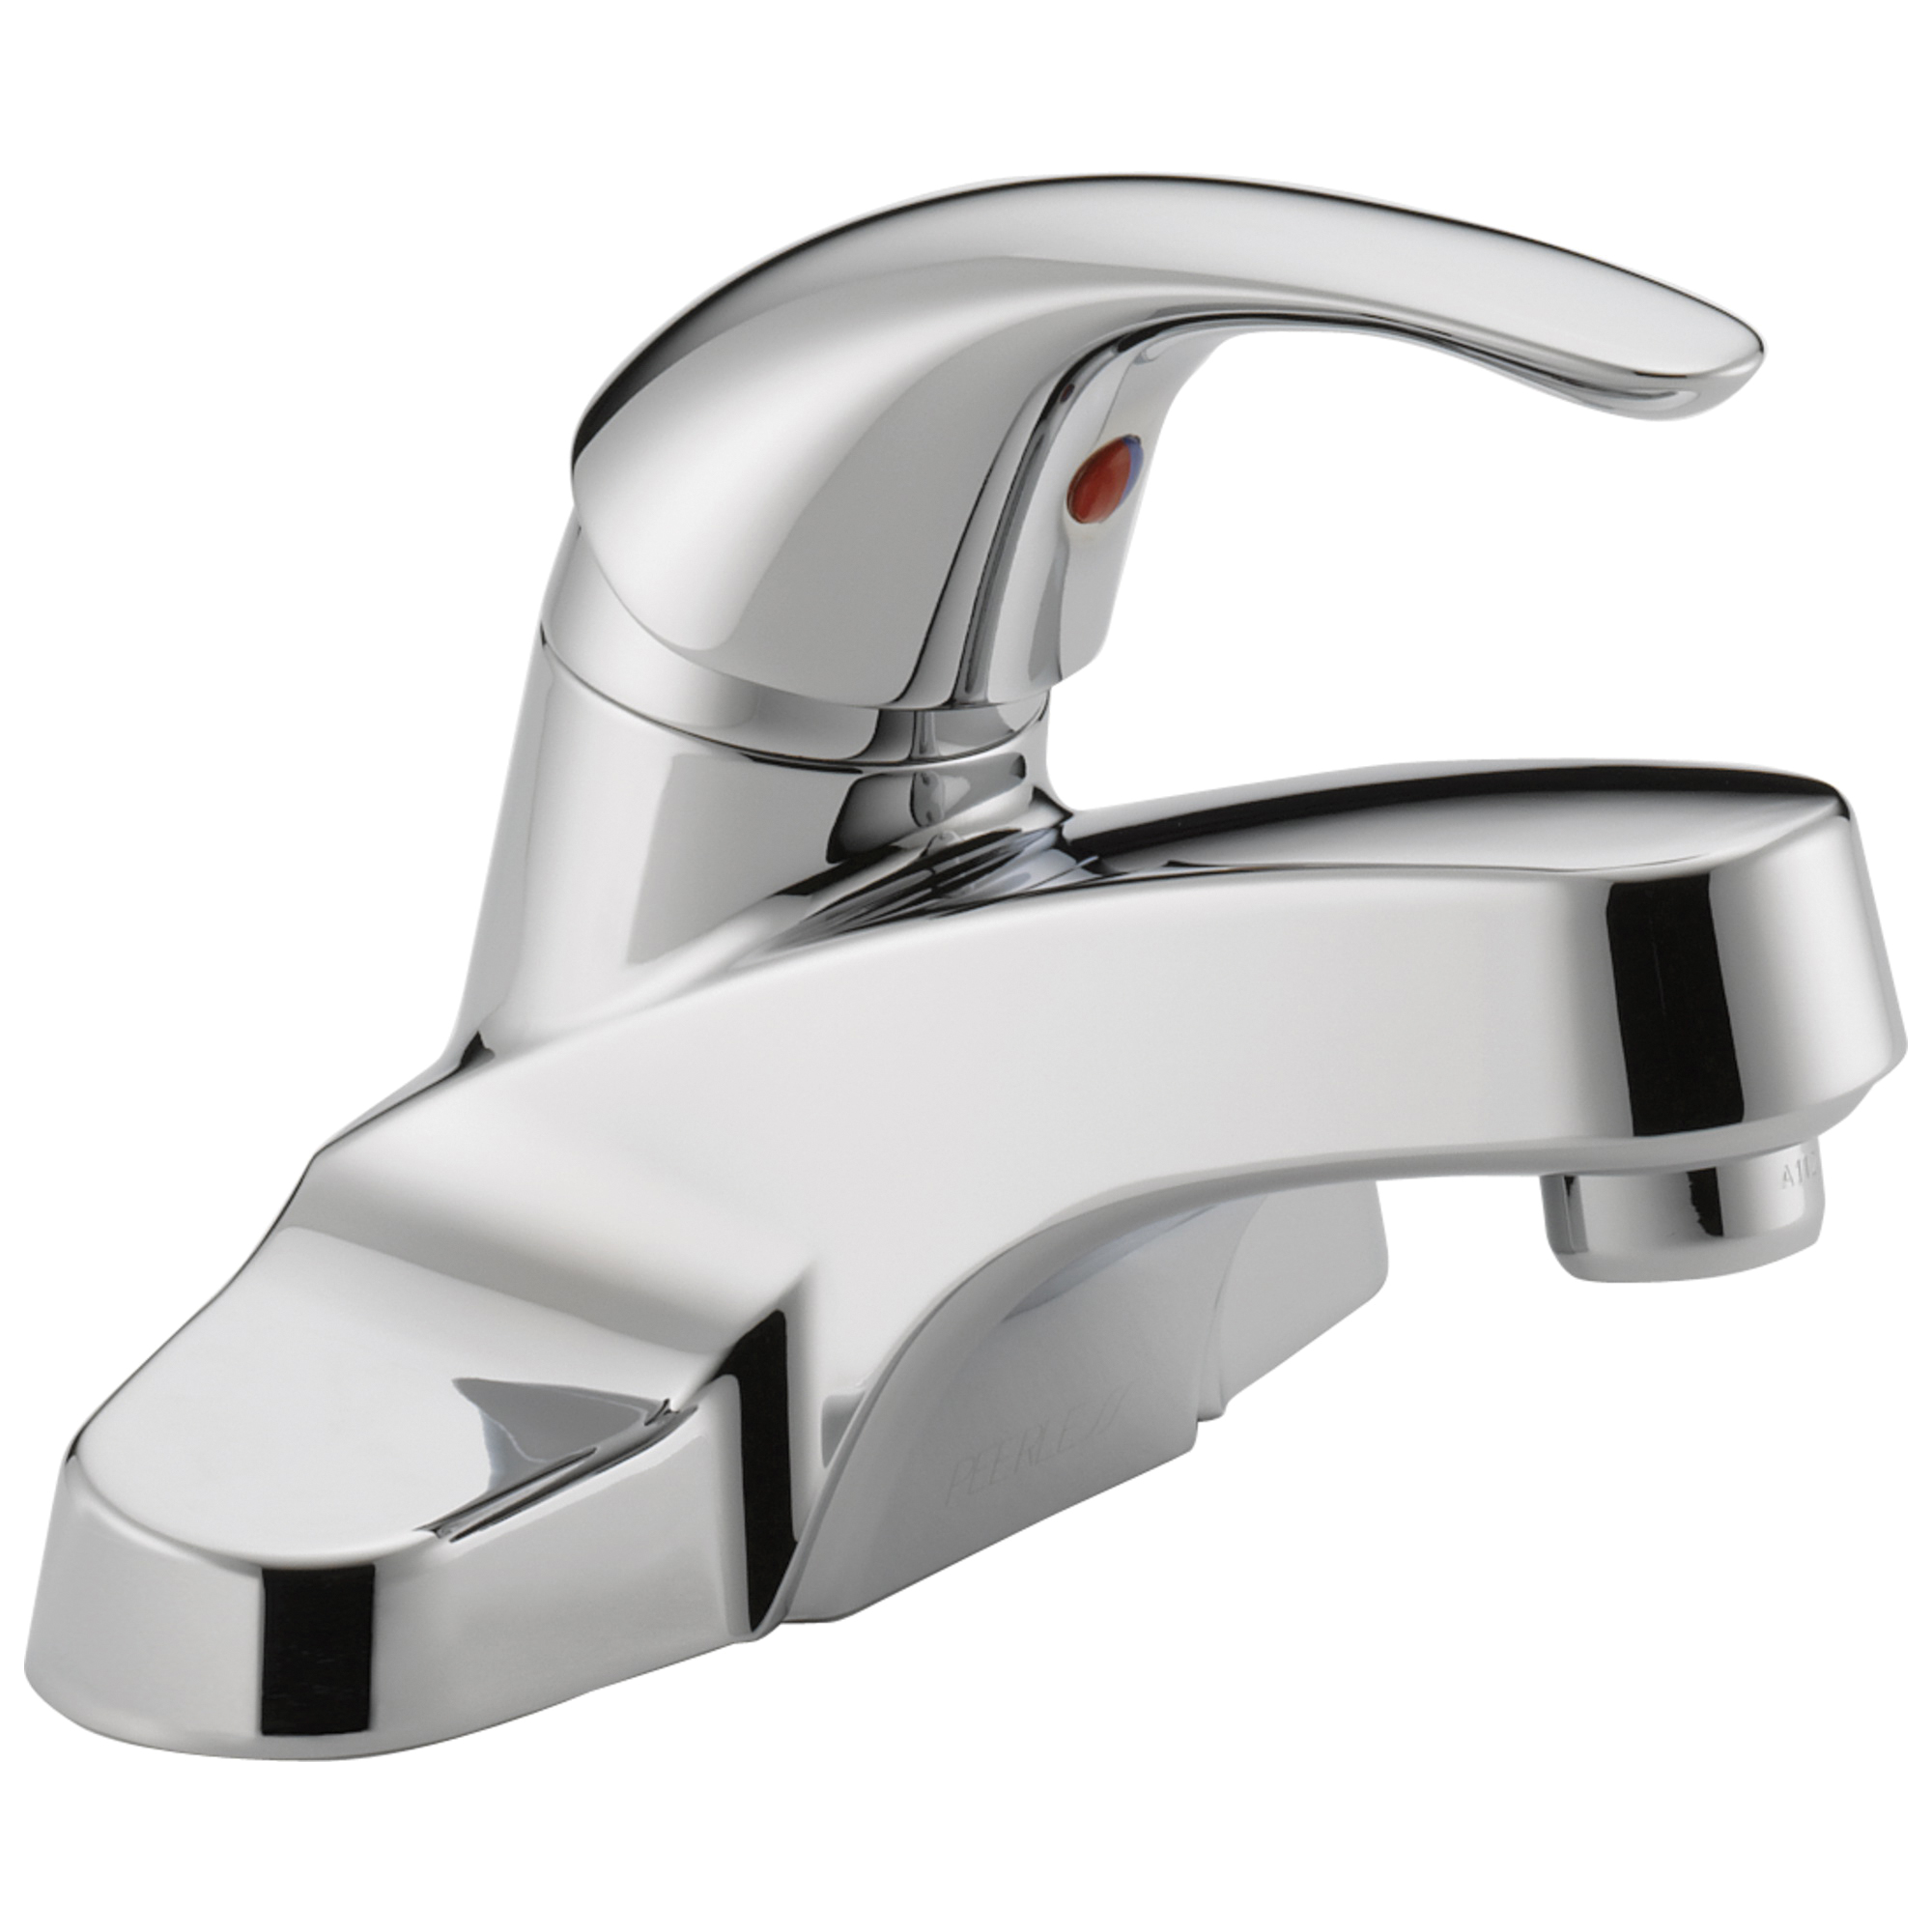 Peerless® P138LF-M Centerset Lavatory Faucet, Choice, Chrome Plated, 1 Handles, Grid Strainer Drain, 1.2 gpm